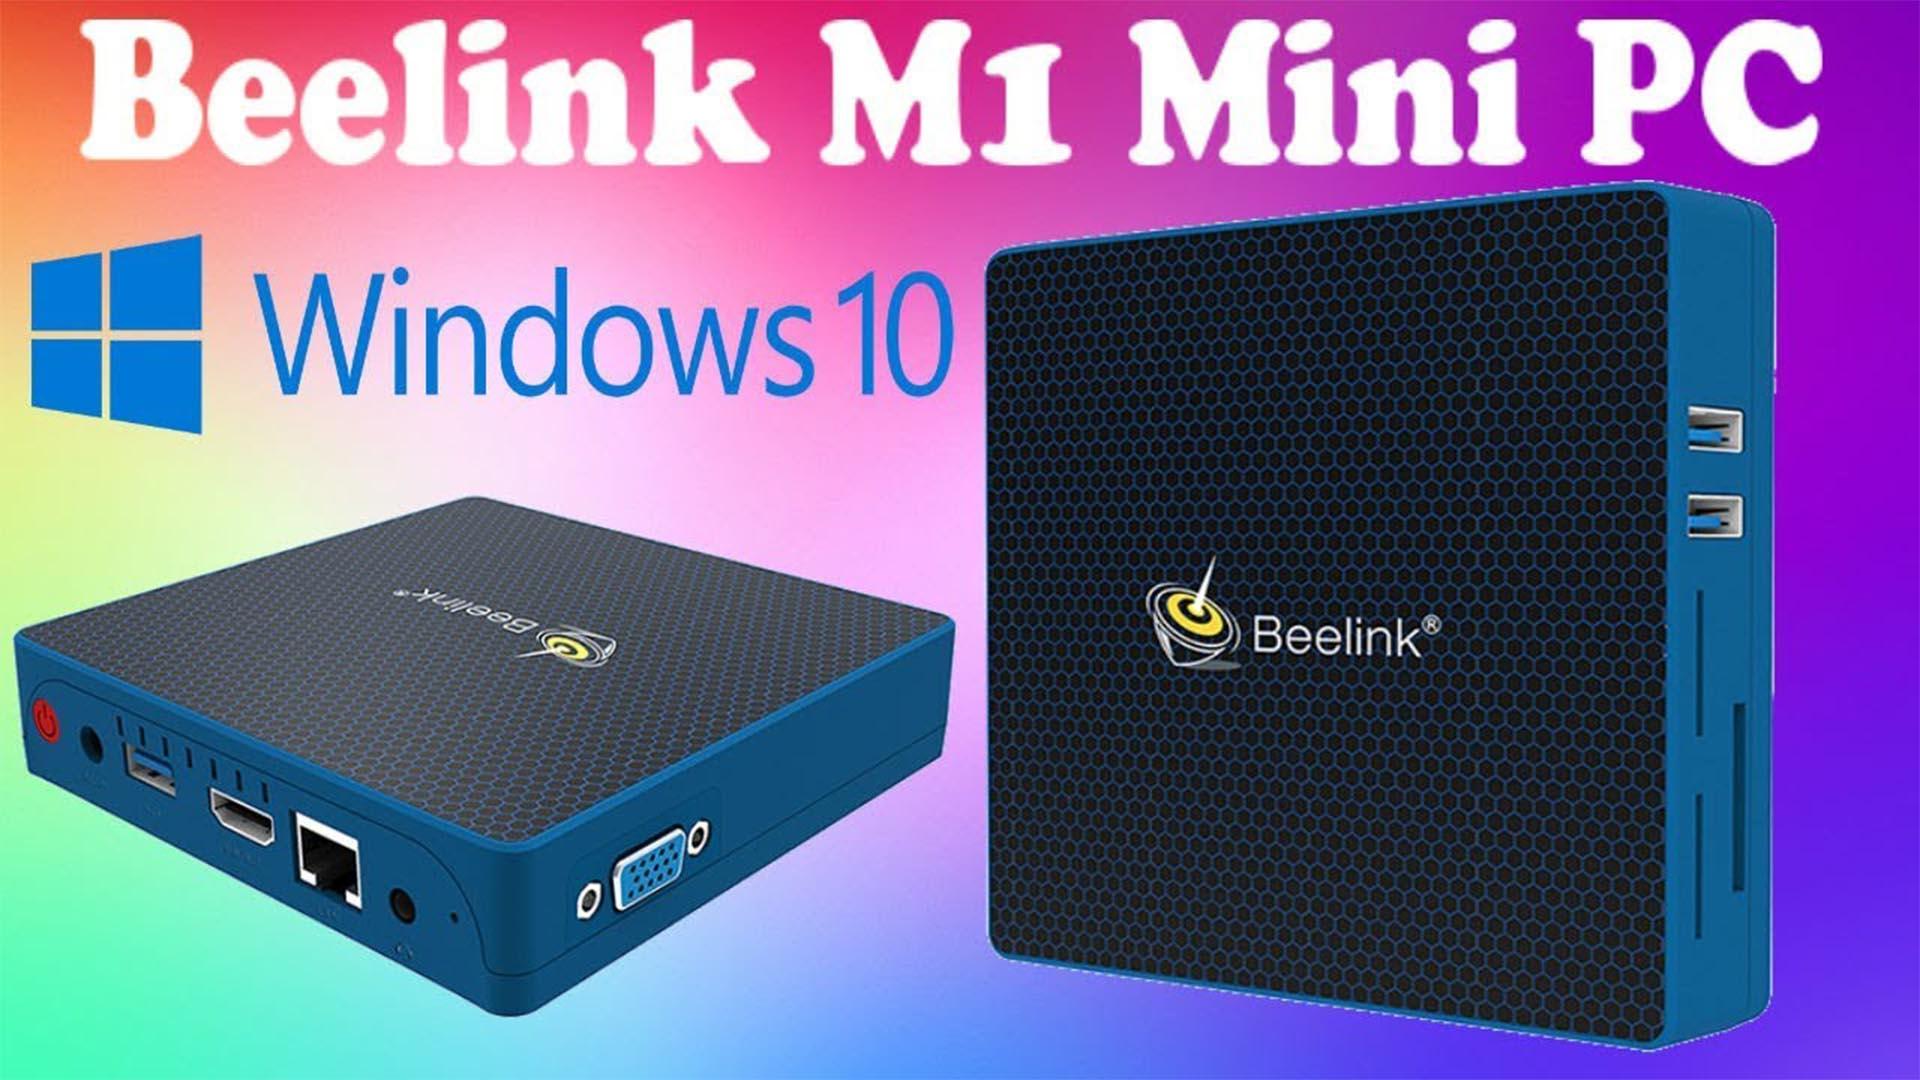 Beelink M1